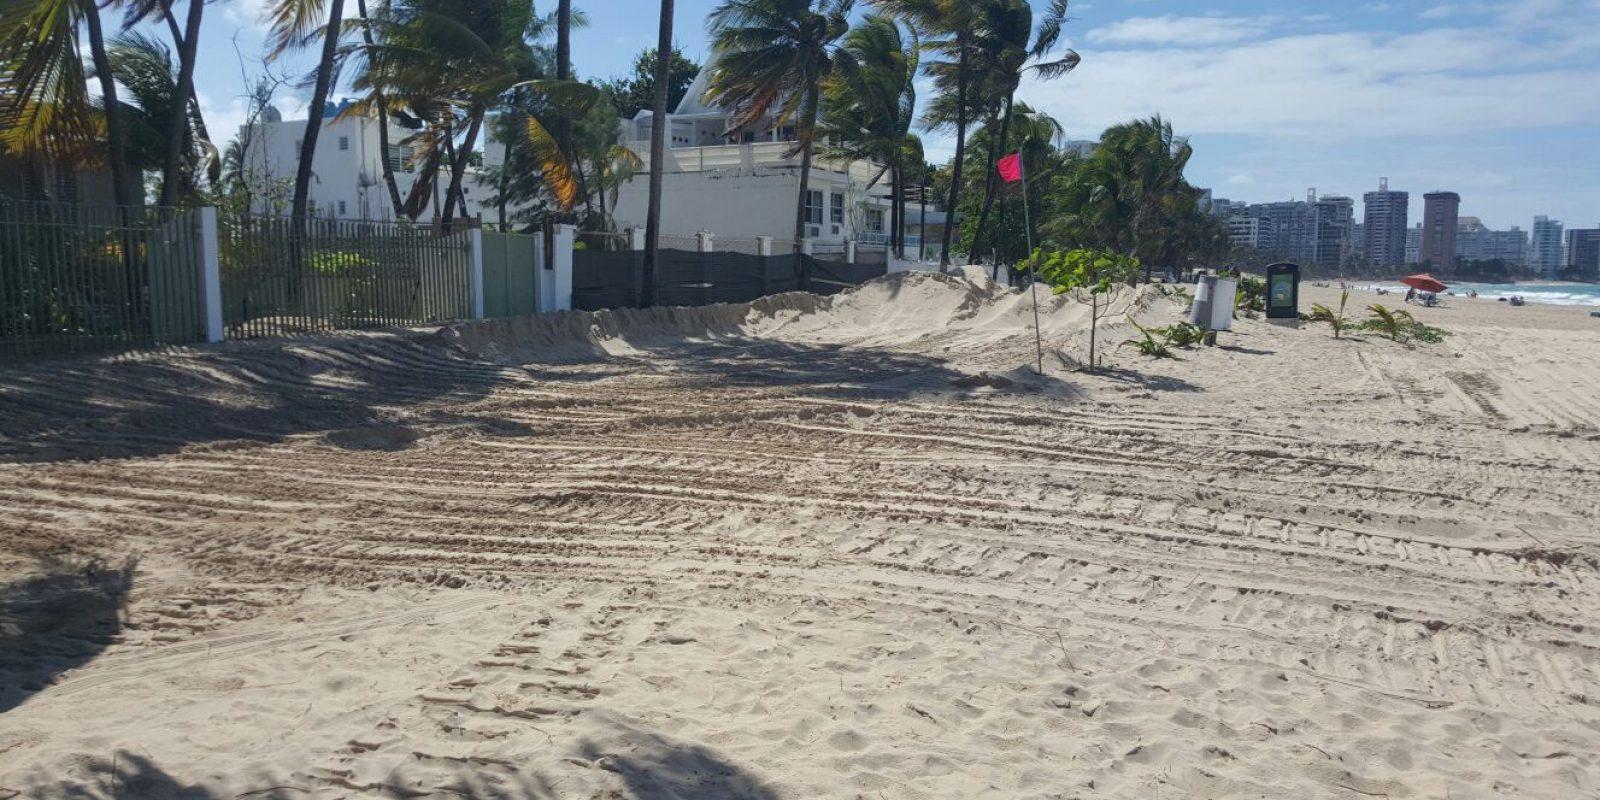 playa tortugas